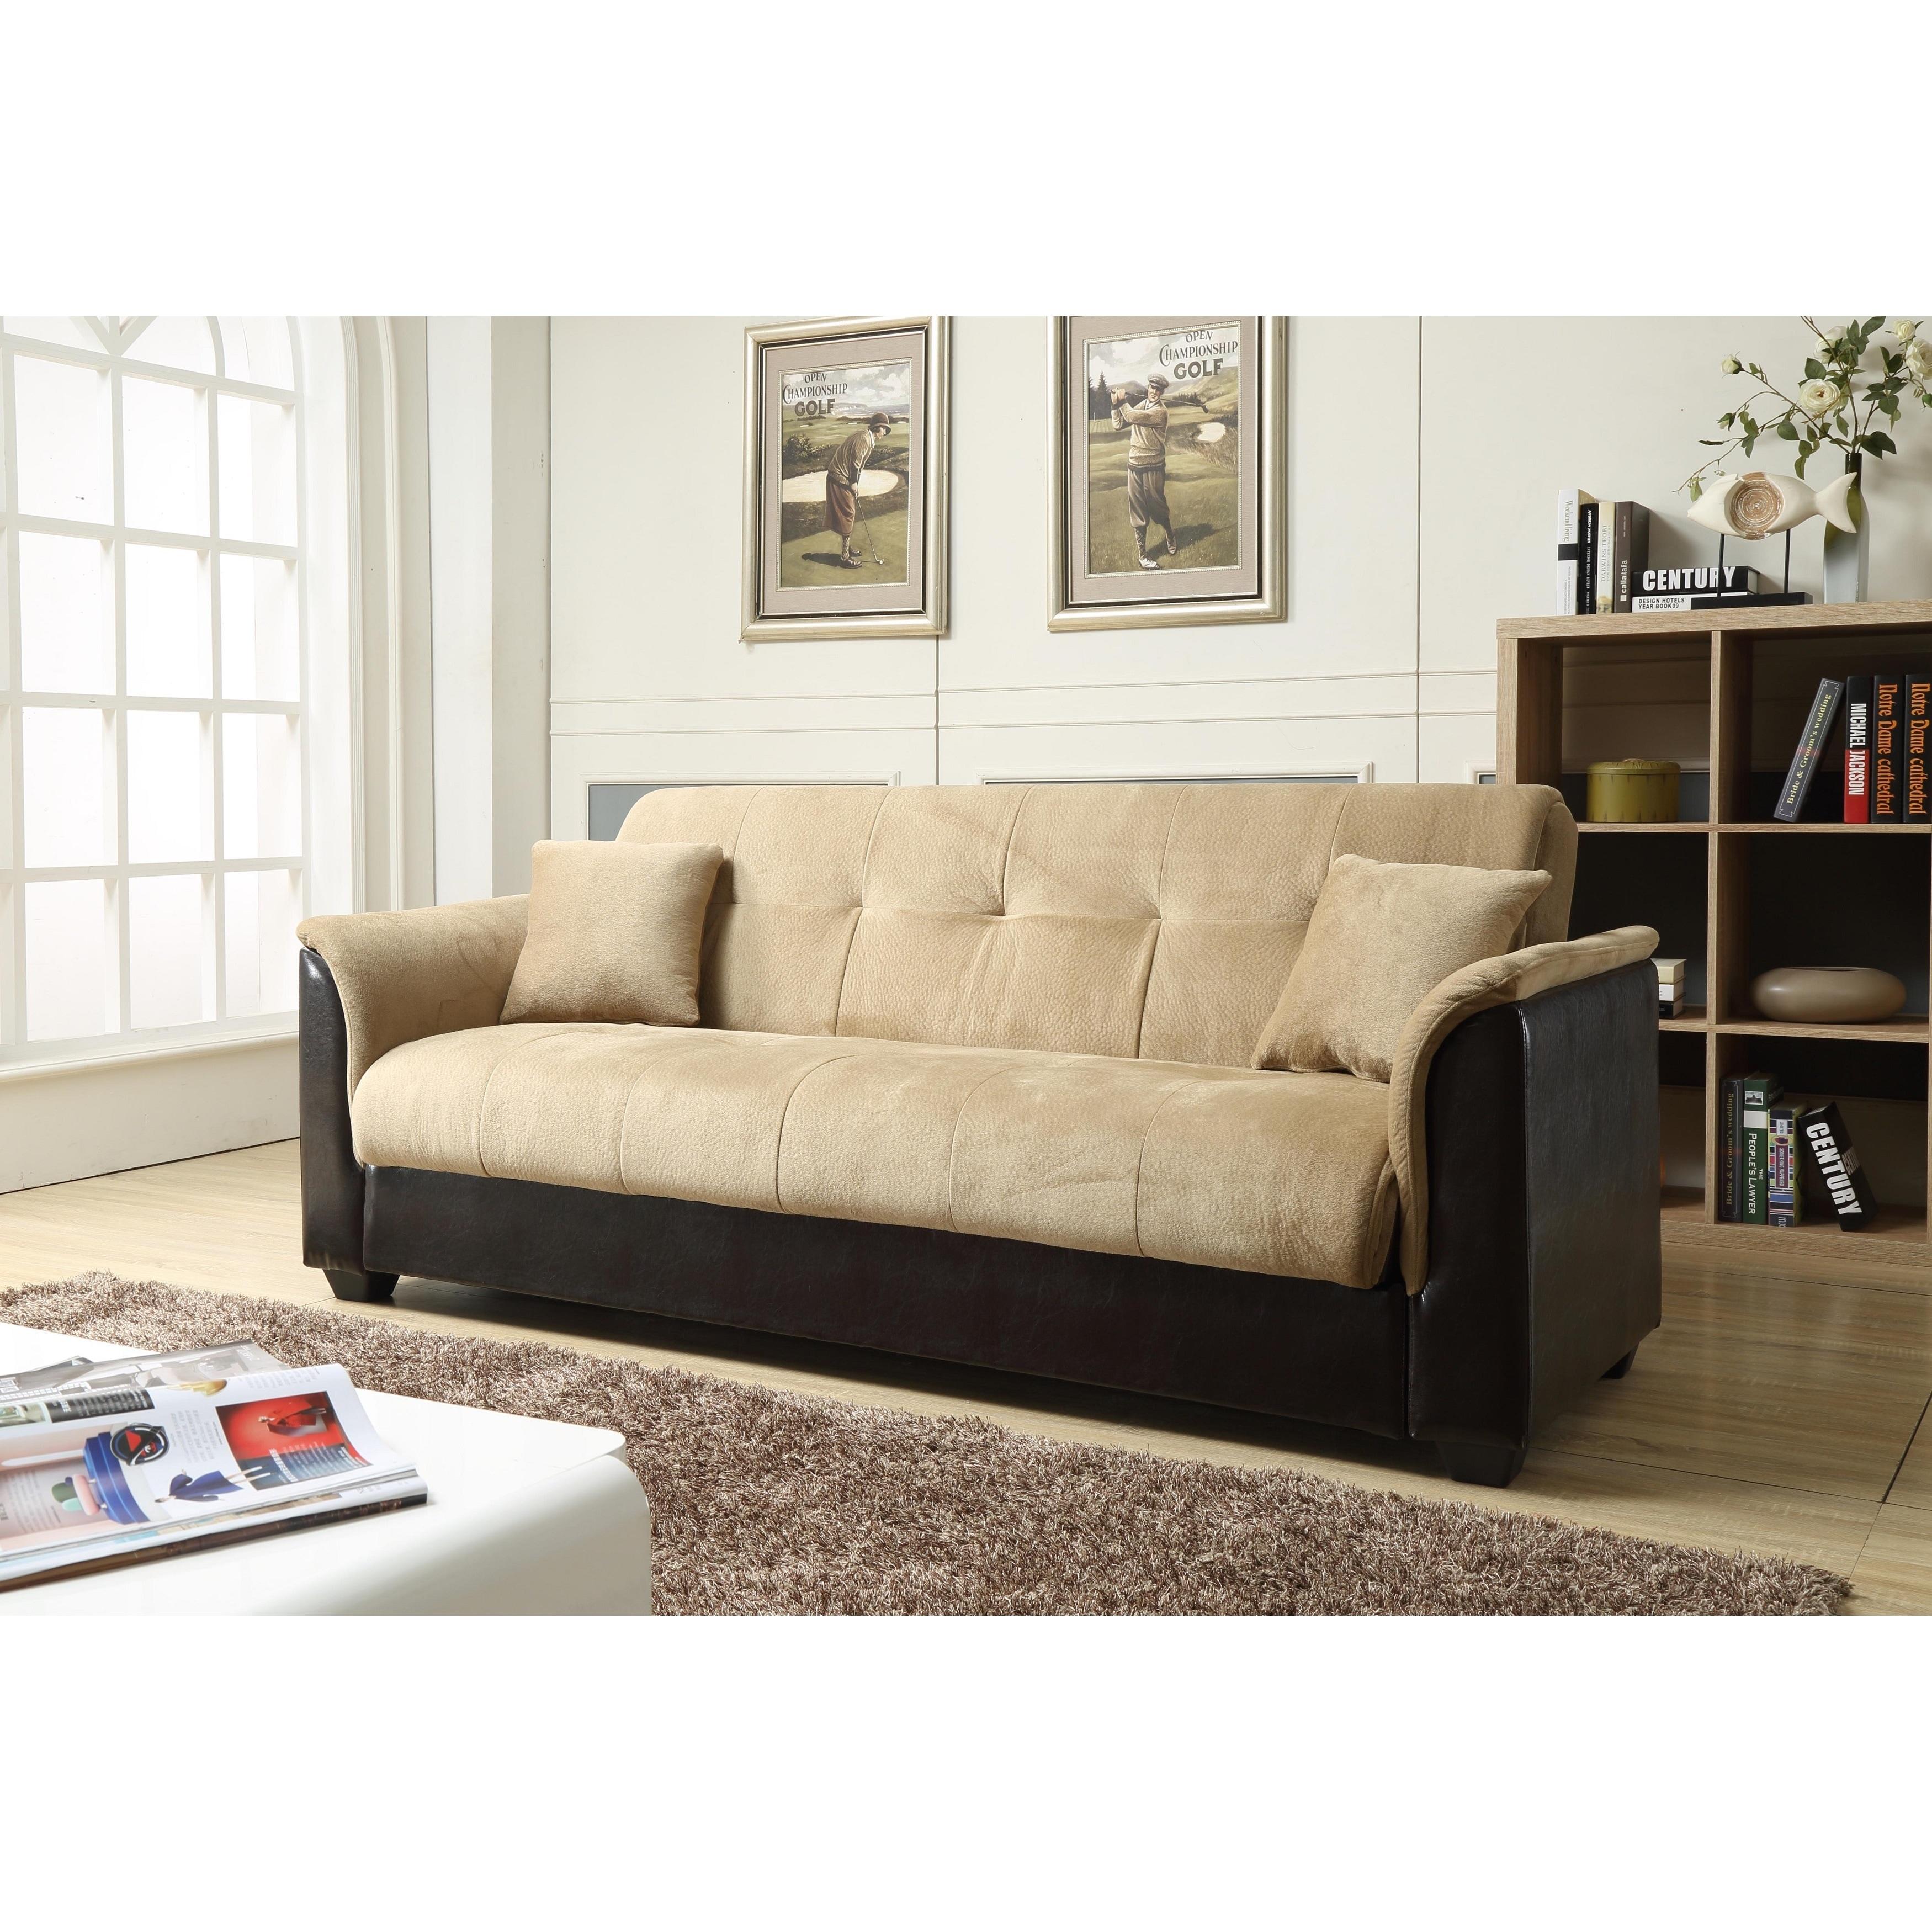 Nathanial Home Melanie Champion Storage Futon Sofa Bed Overstock 12494304